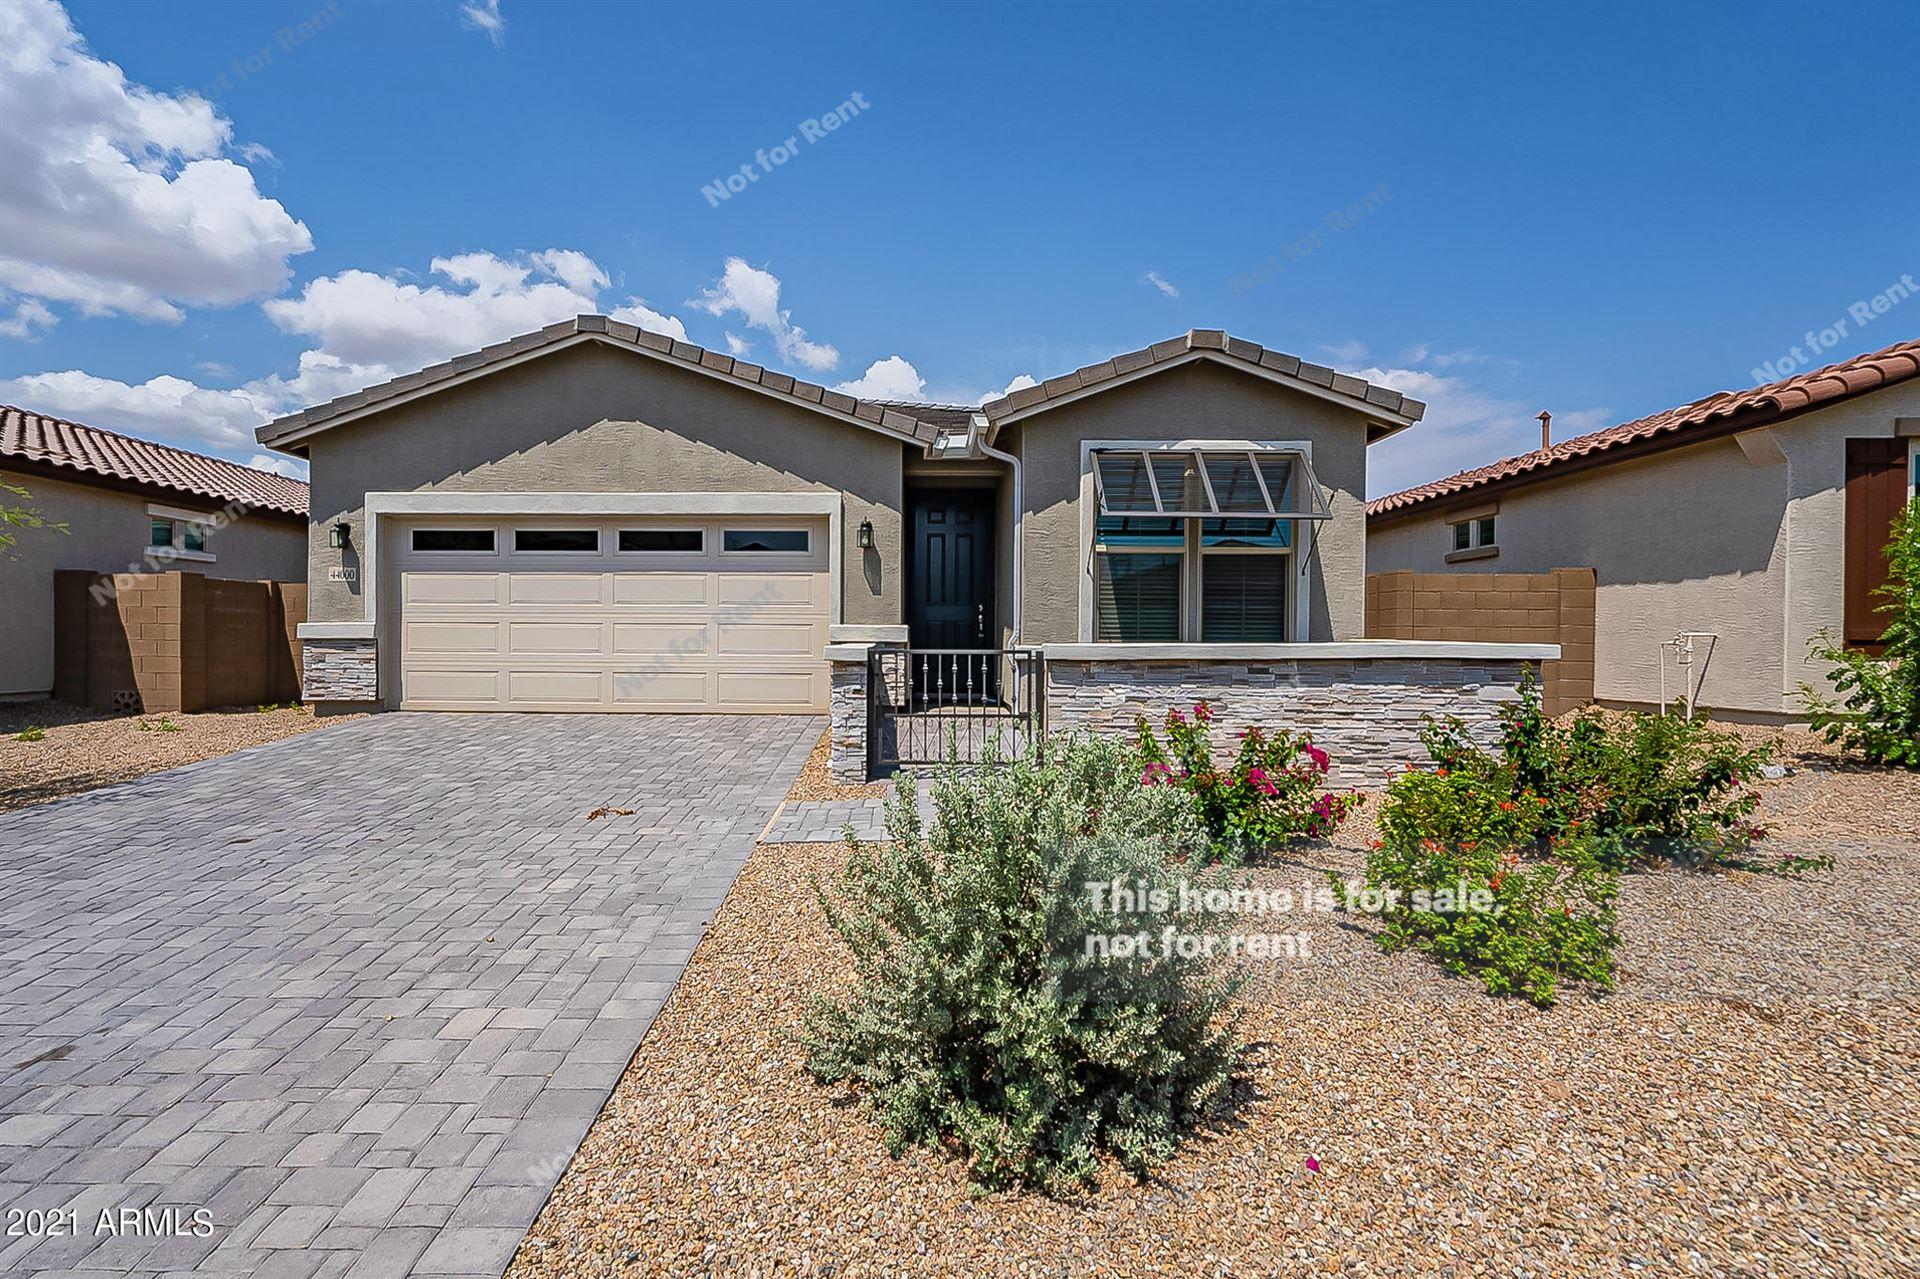 Photo for 44000 W PALO OLMO Road, Maricopa, AZ 85138 (MLS # 6282759)